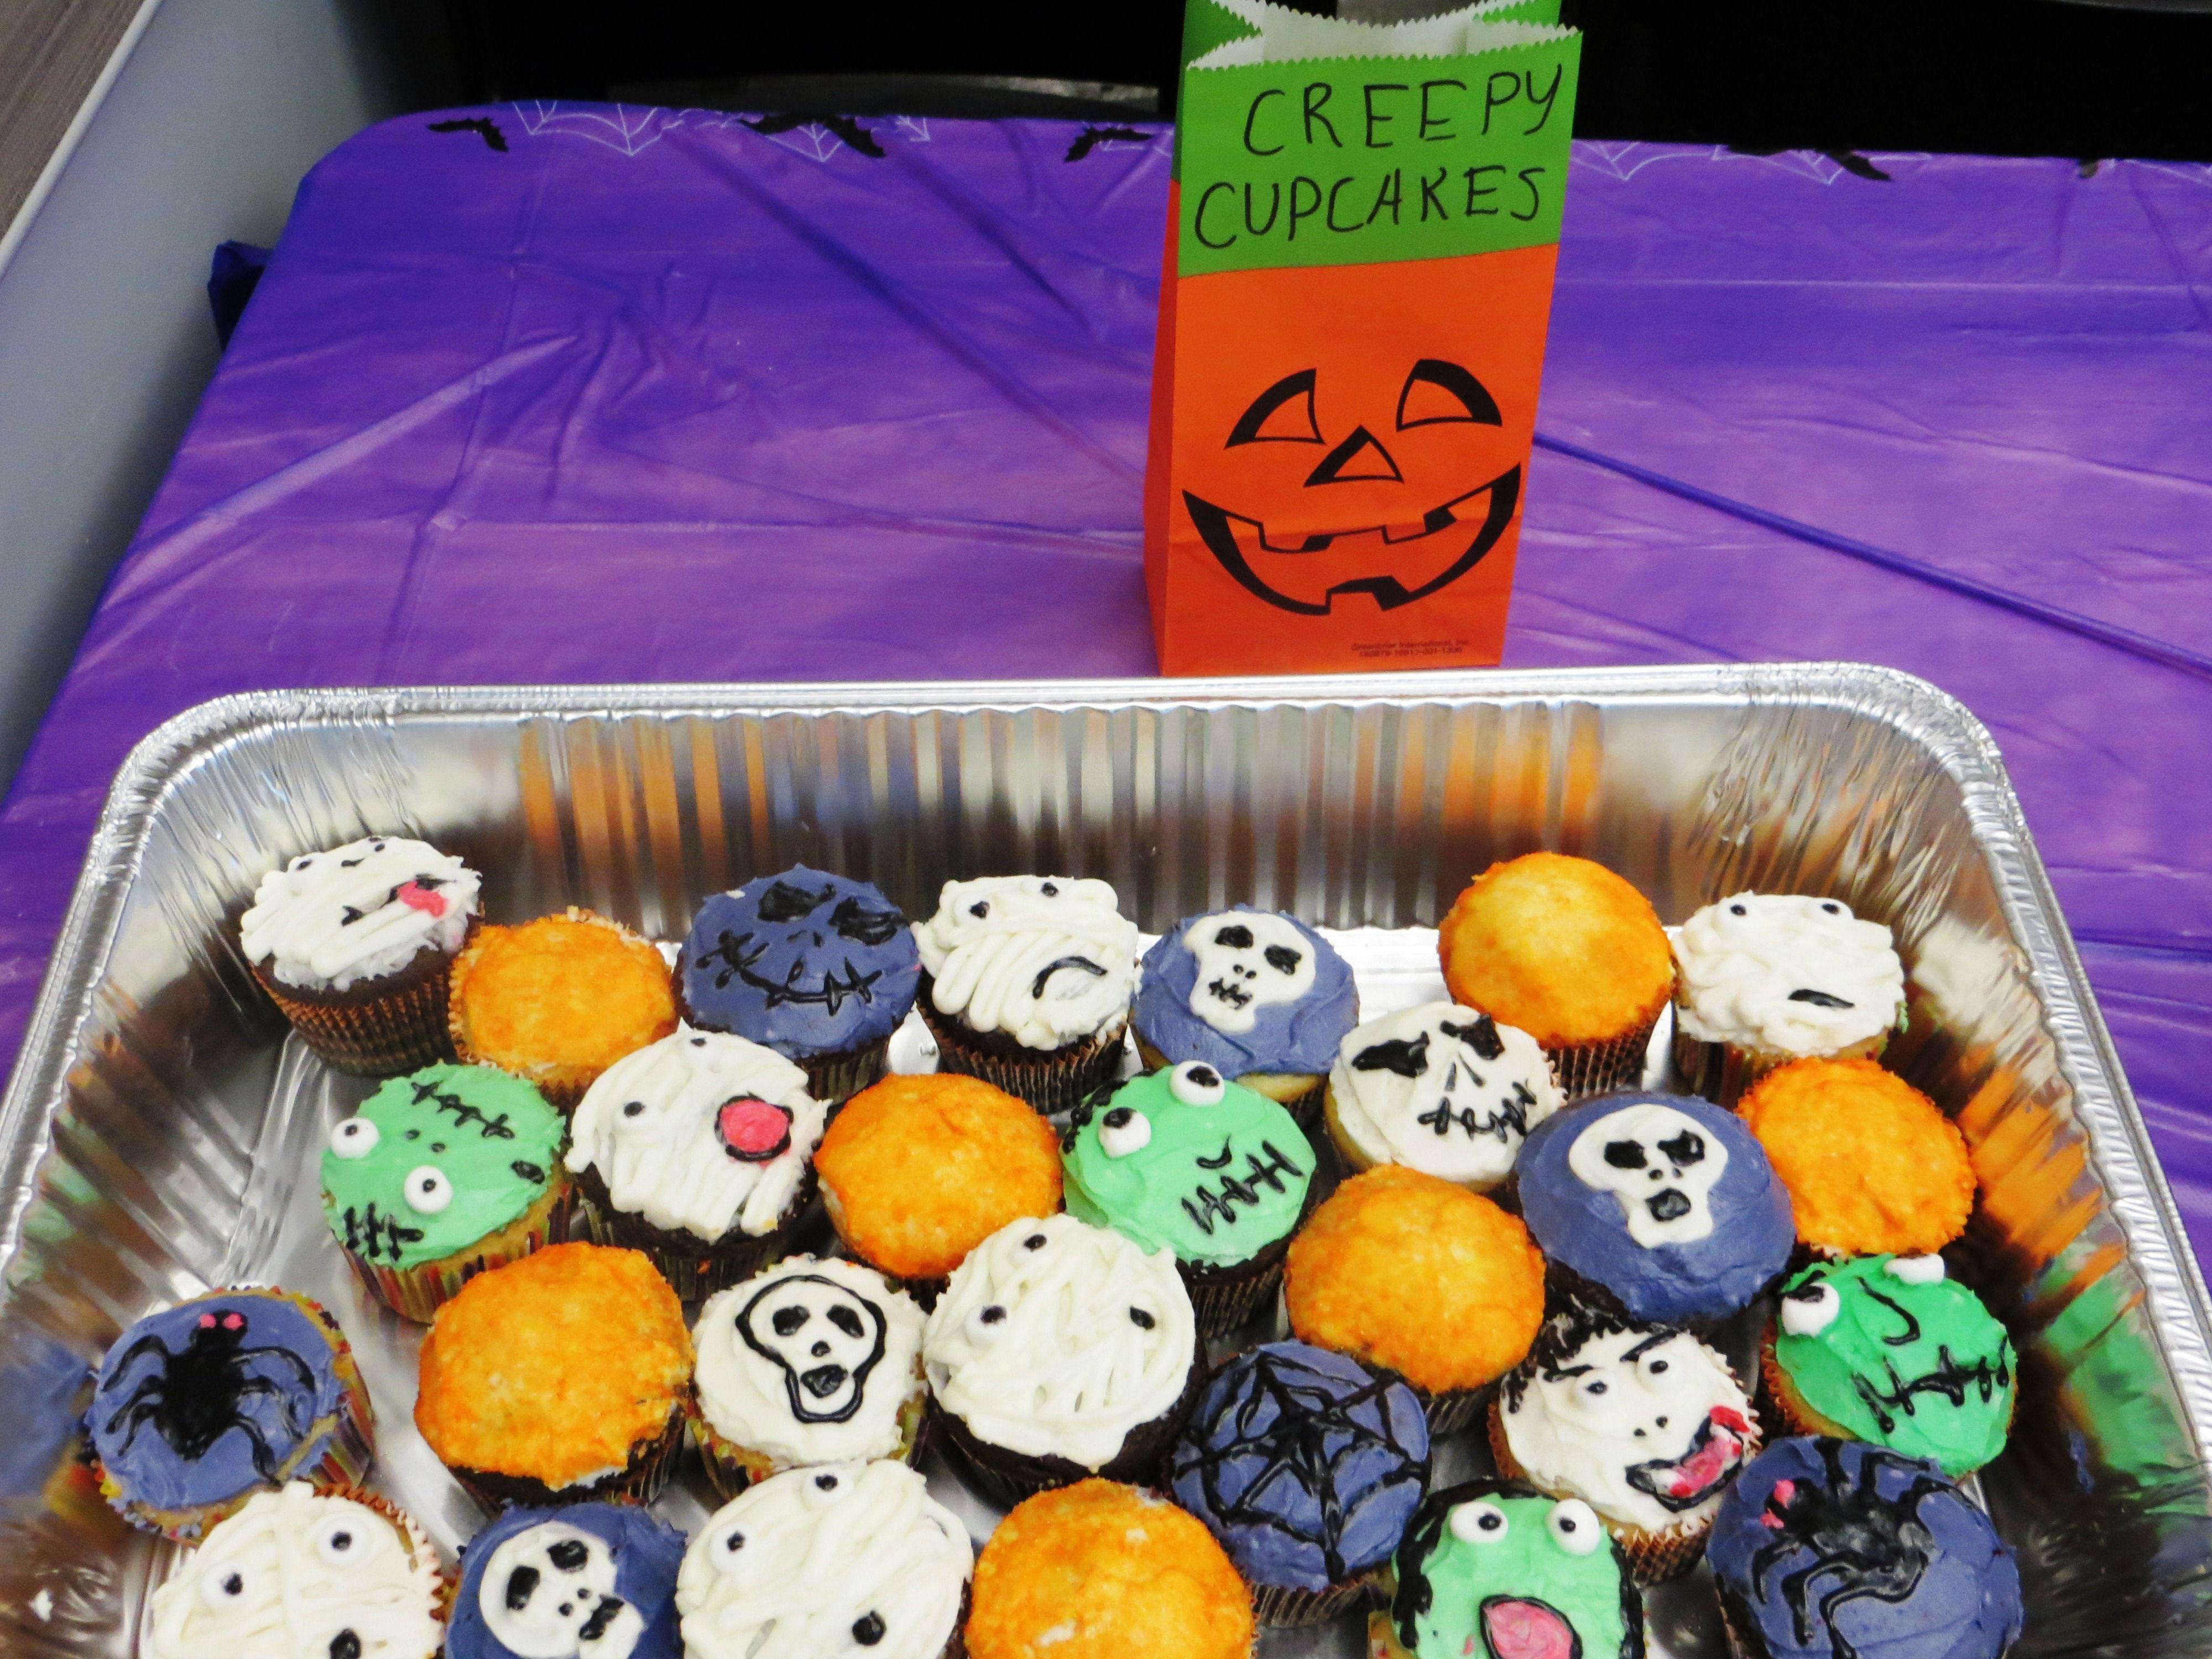 Creepy Cupcakes!